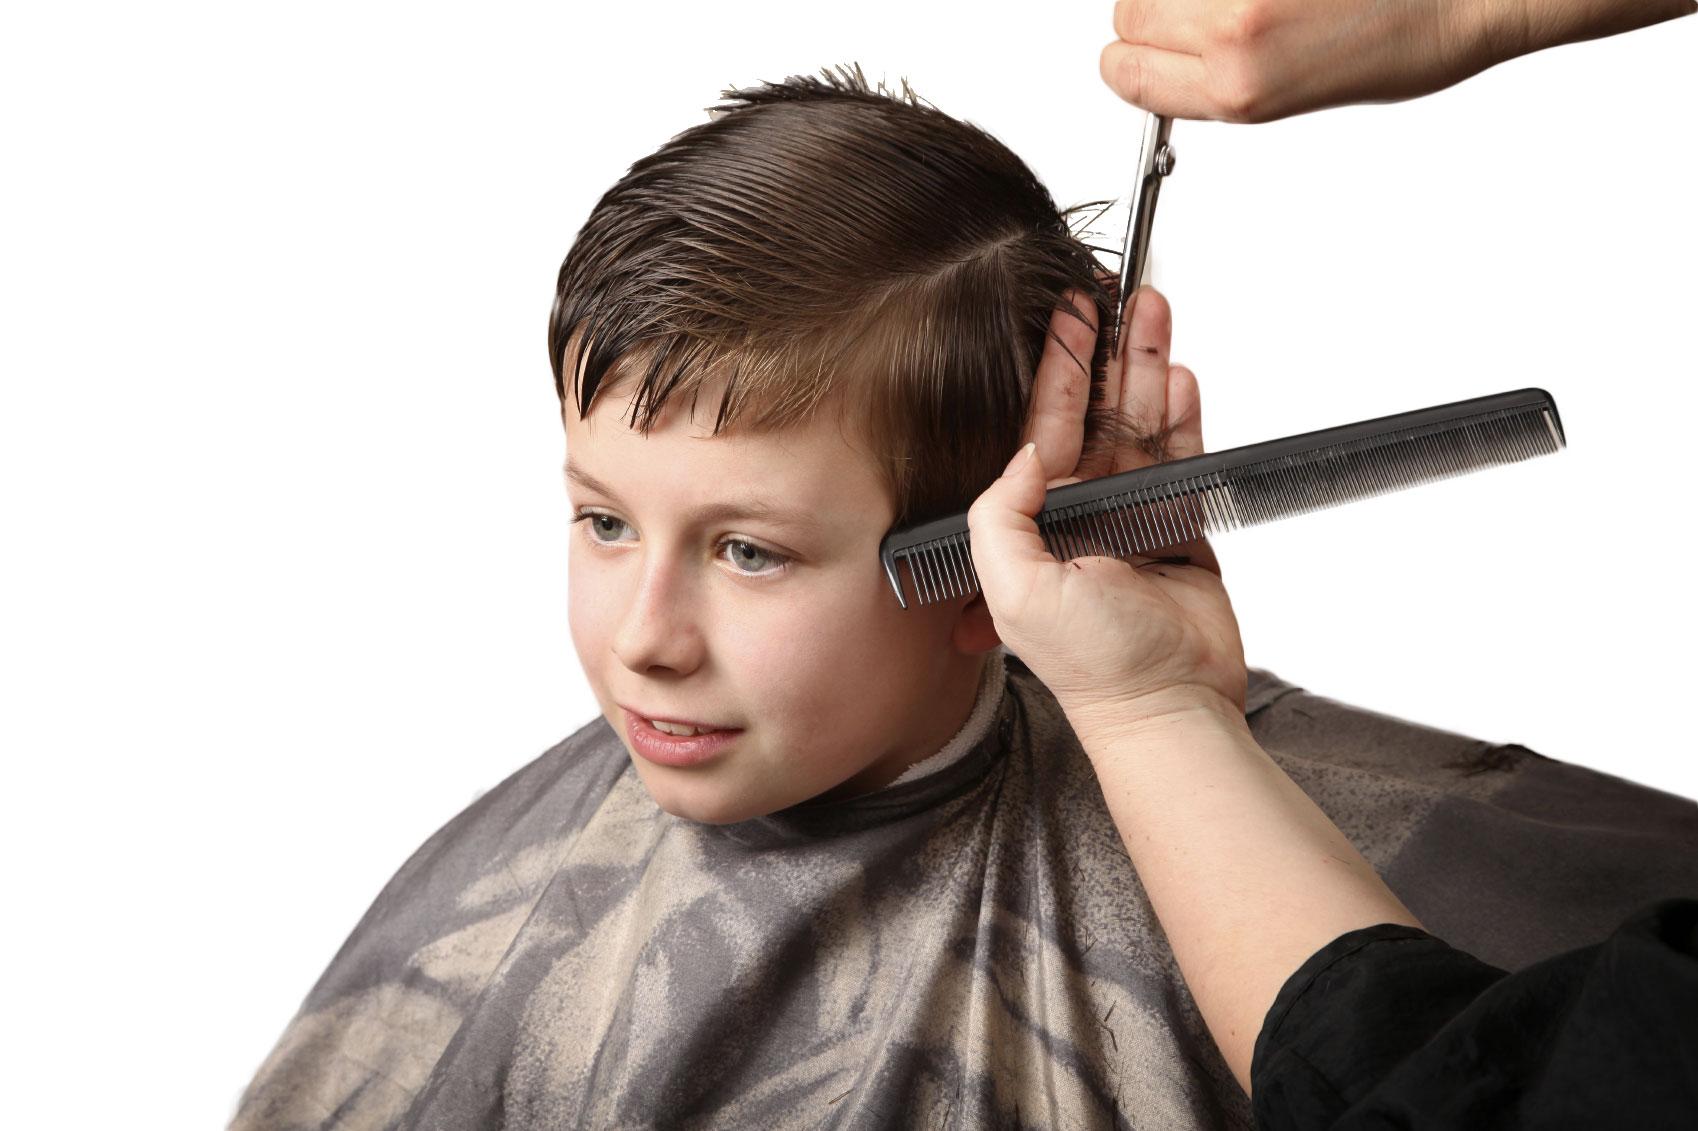 Incredible Hair Cut Amp Style For Him Men39S Hair Cuts Amp Salon Friendswood Texas Short Hairstyles Gunalazisus